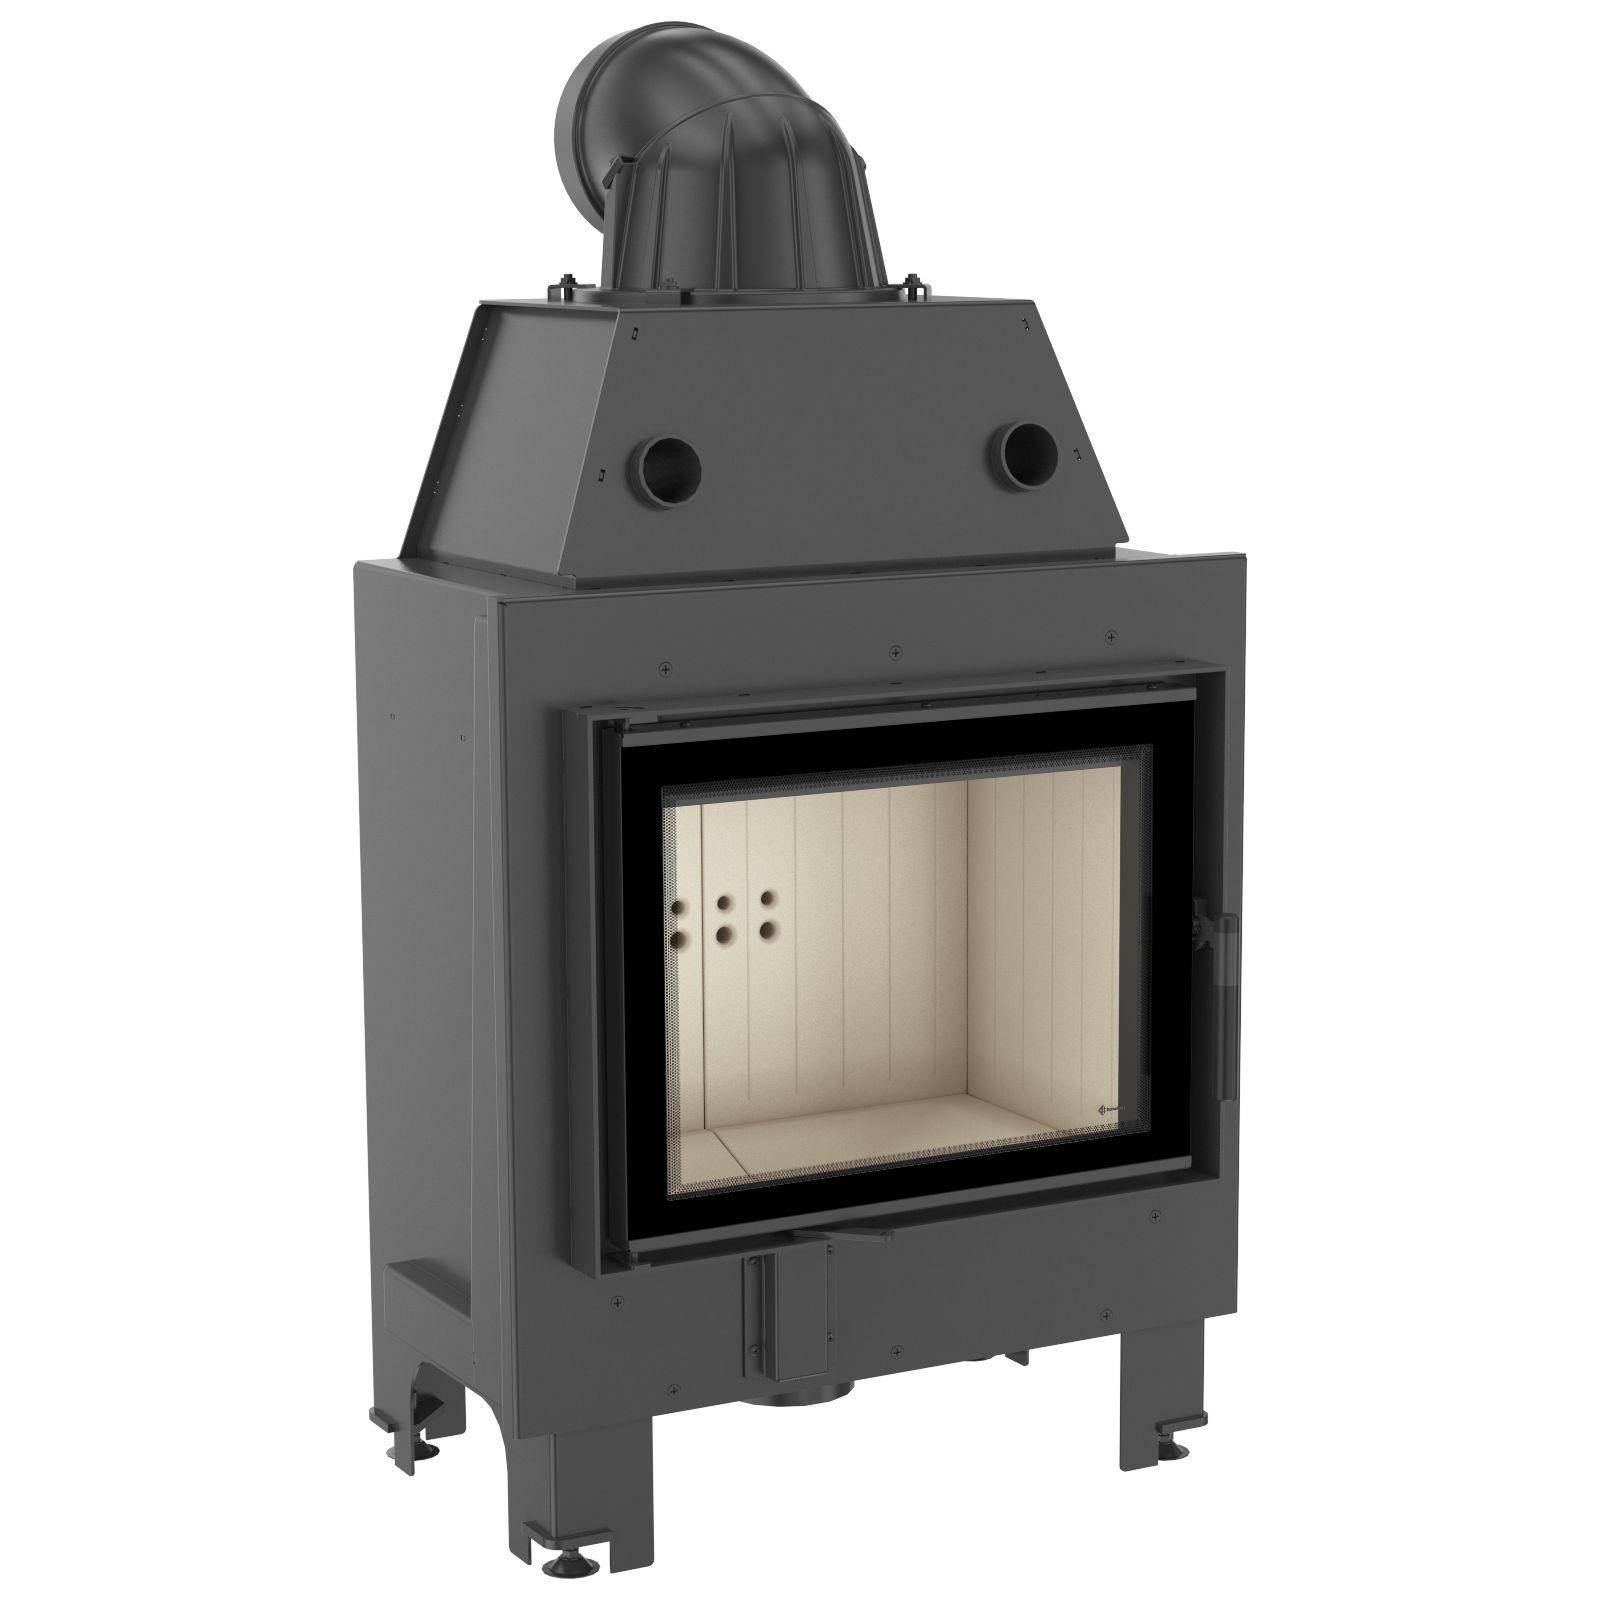 kamineinsatz kratki mbm 10 kw. Black Bedroom Furniture Sets. Home Design Ideas